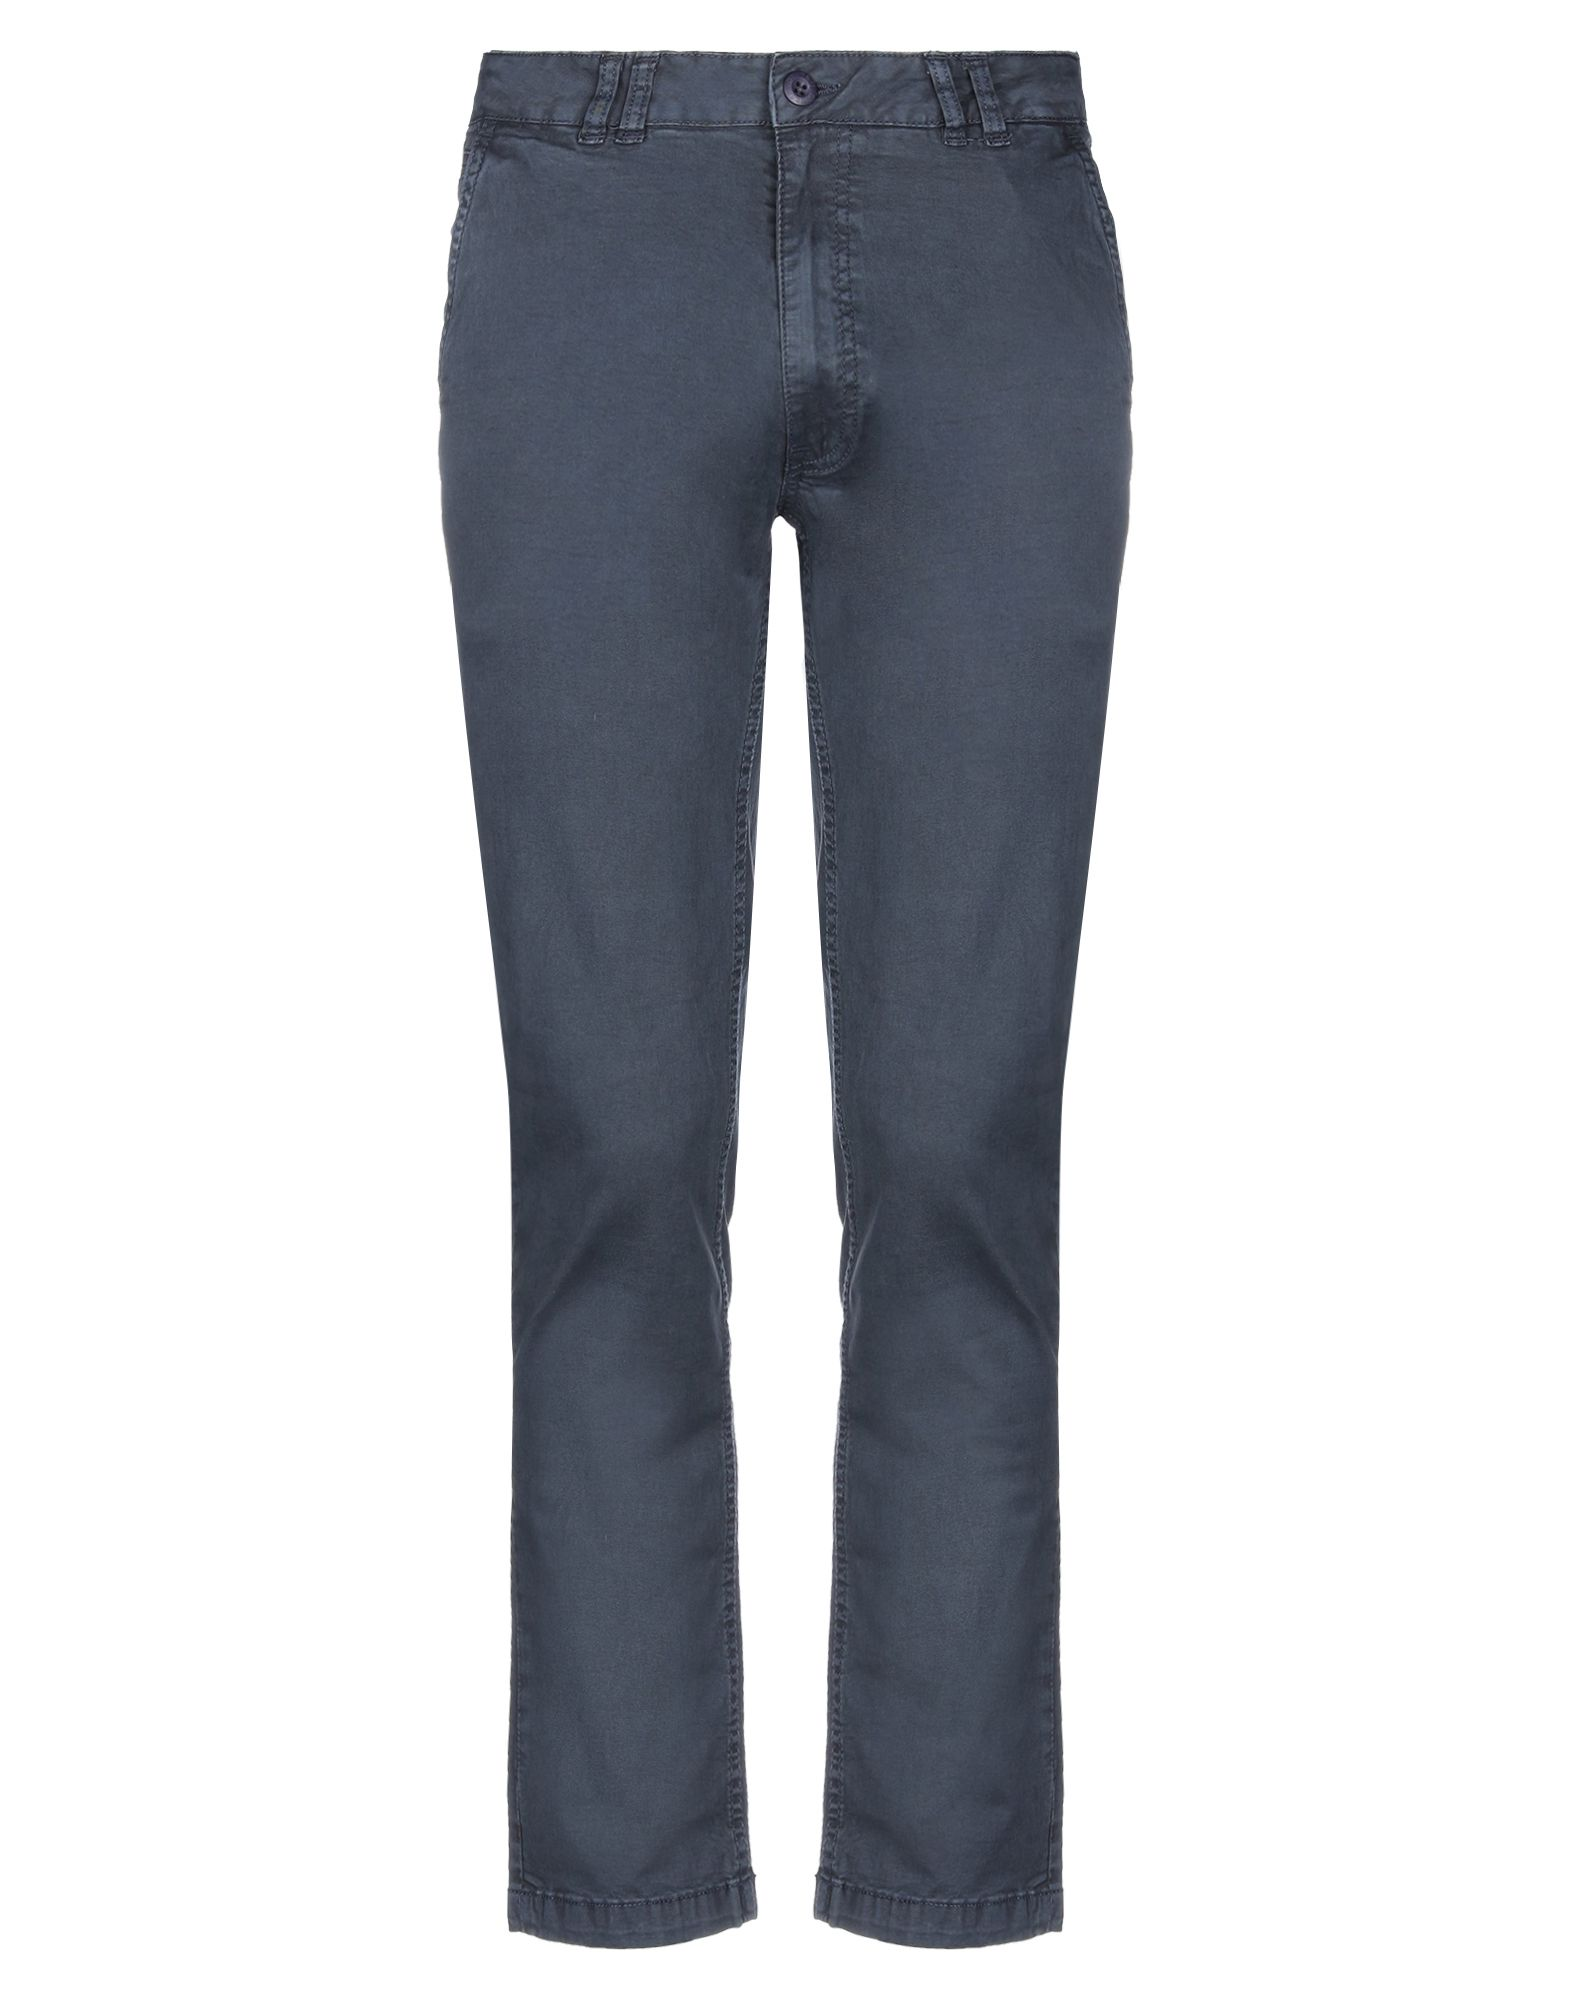 TRU TRUSSARDI Повседневные брюки брюки tru trussardi 566859